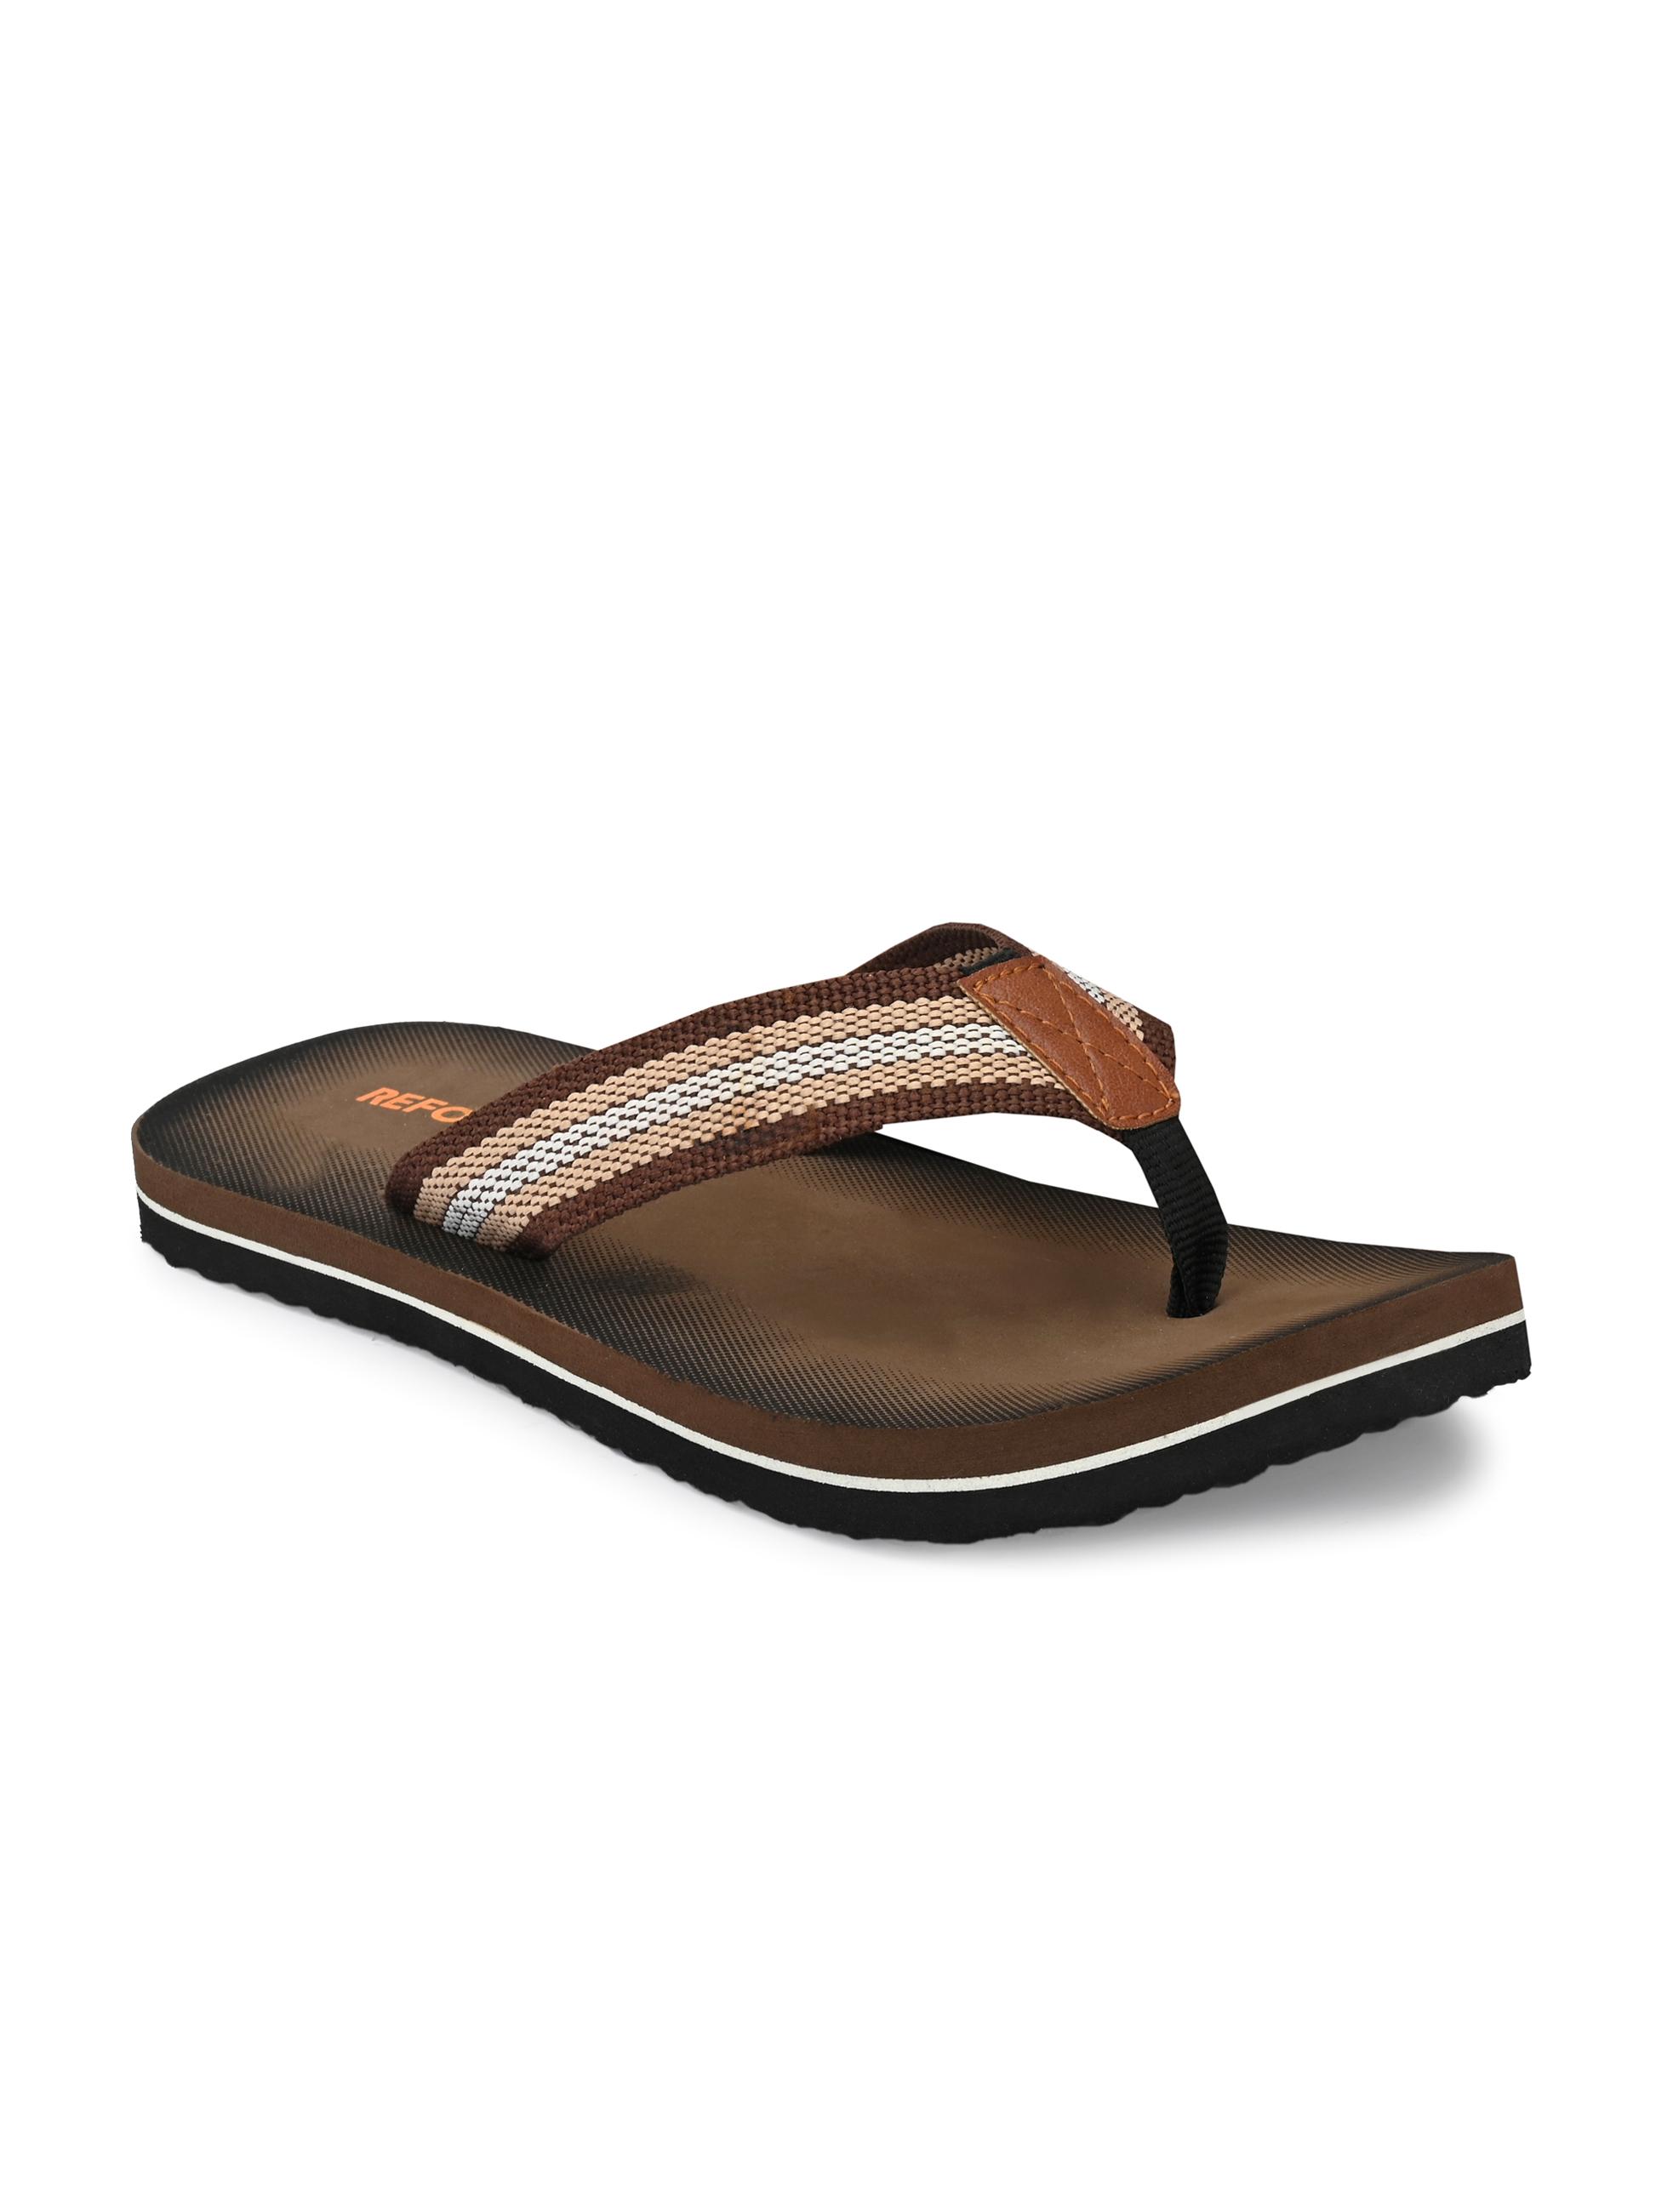 REFORCE | Reforce Men's Brown Fabric Casual Slipper